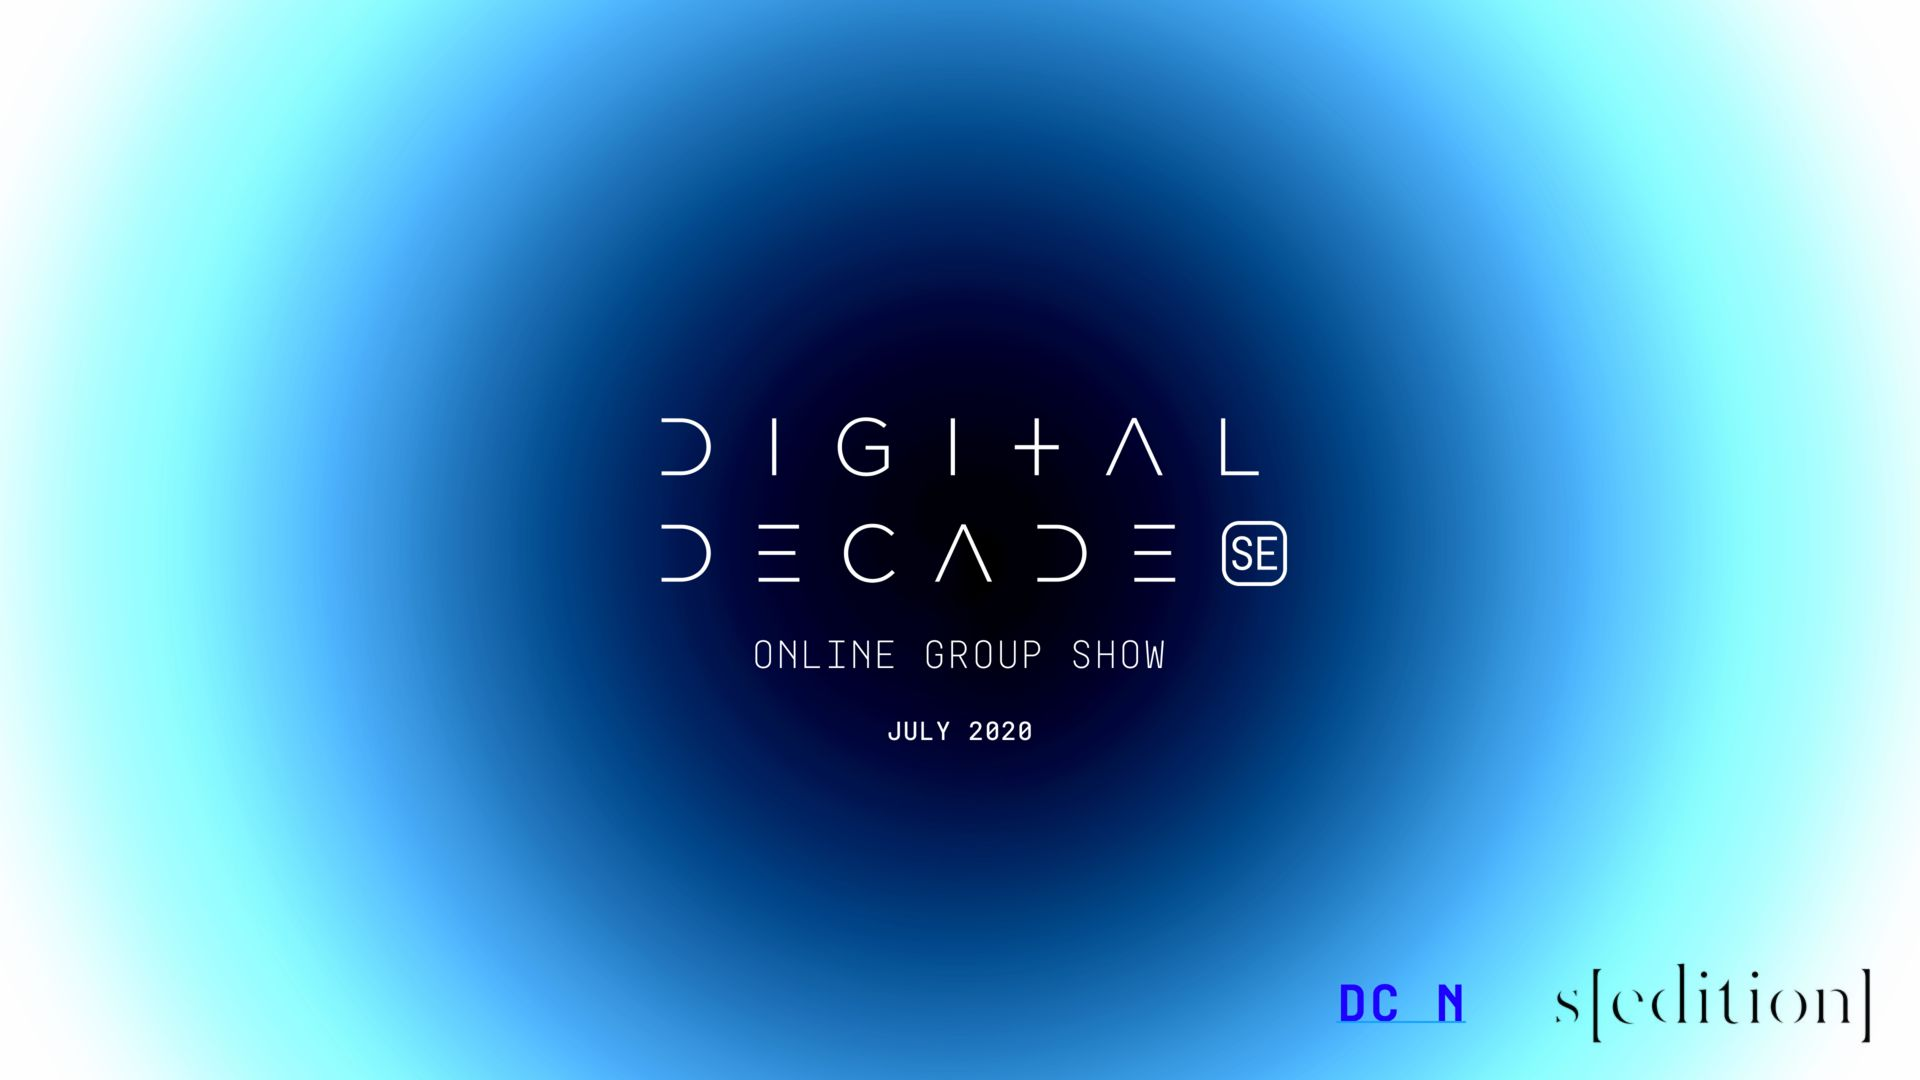 Digital Decade SE